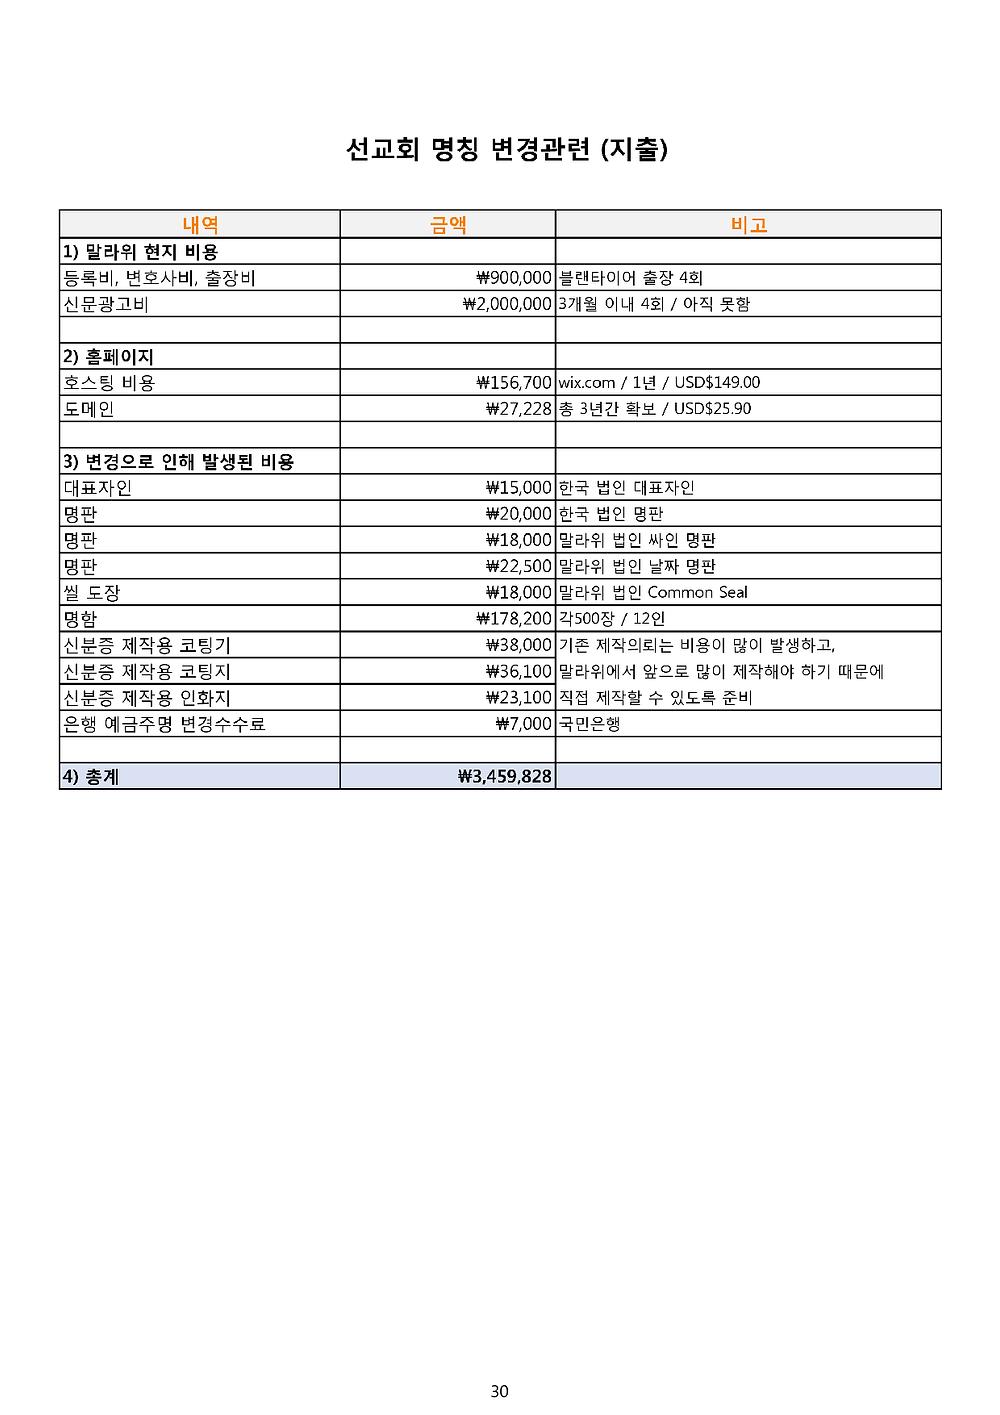 NWM 2014년 선교보고_30.png